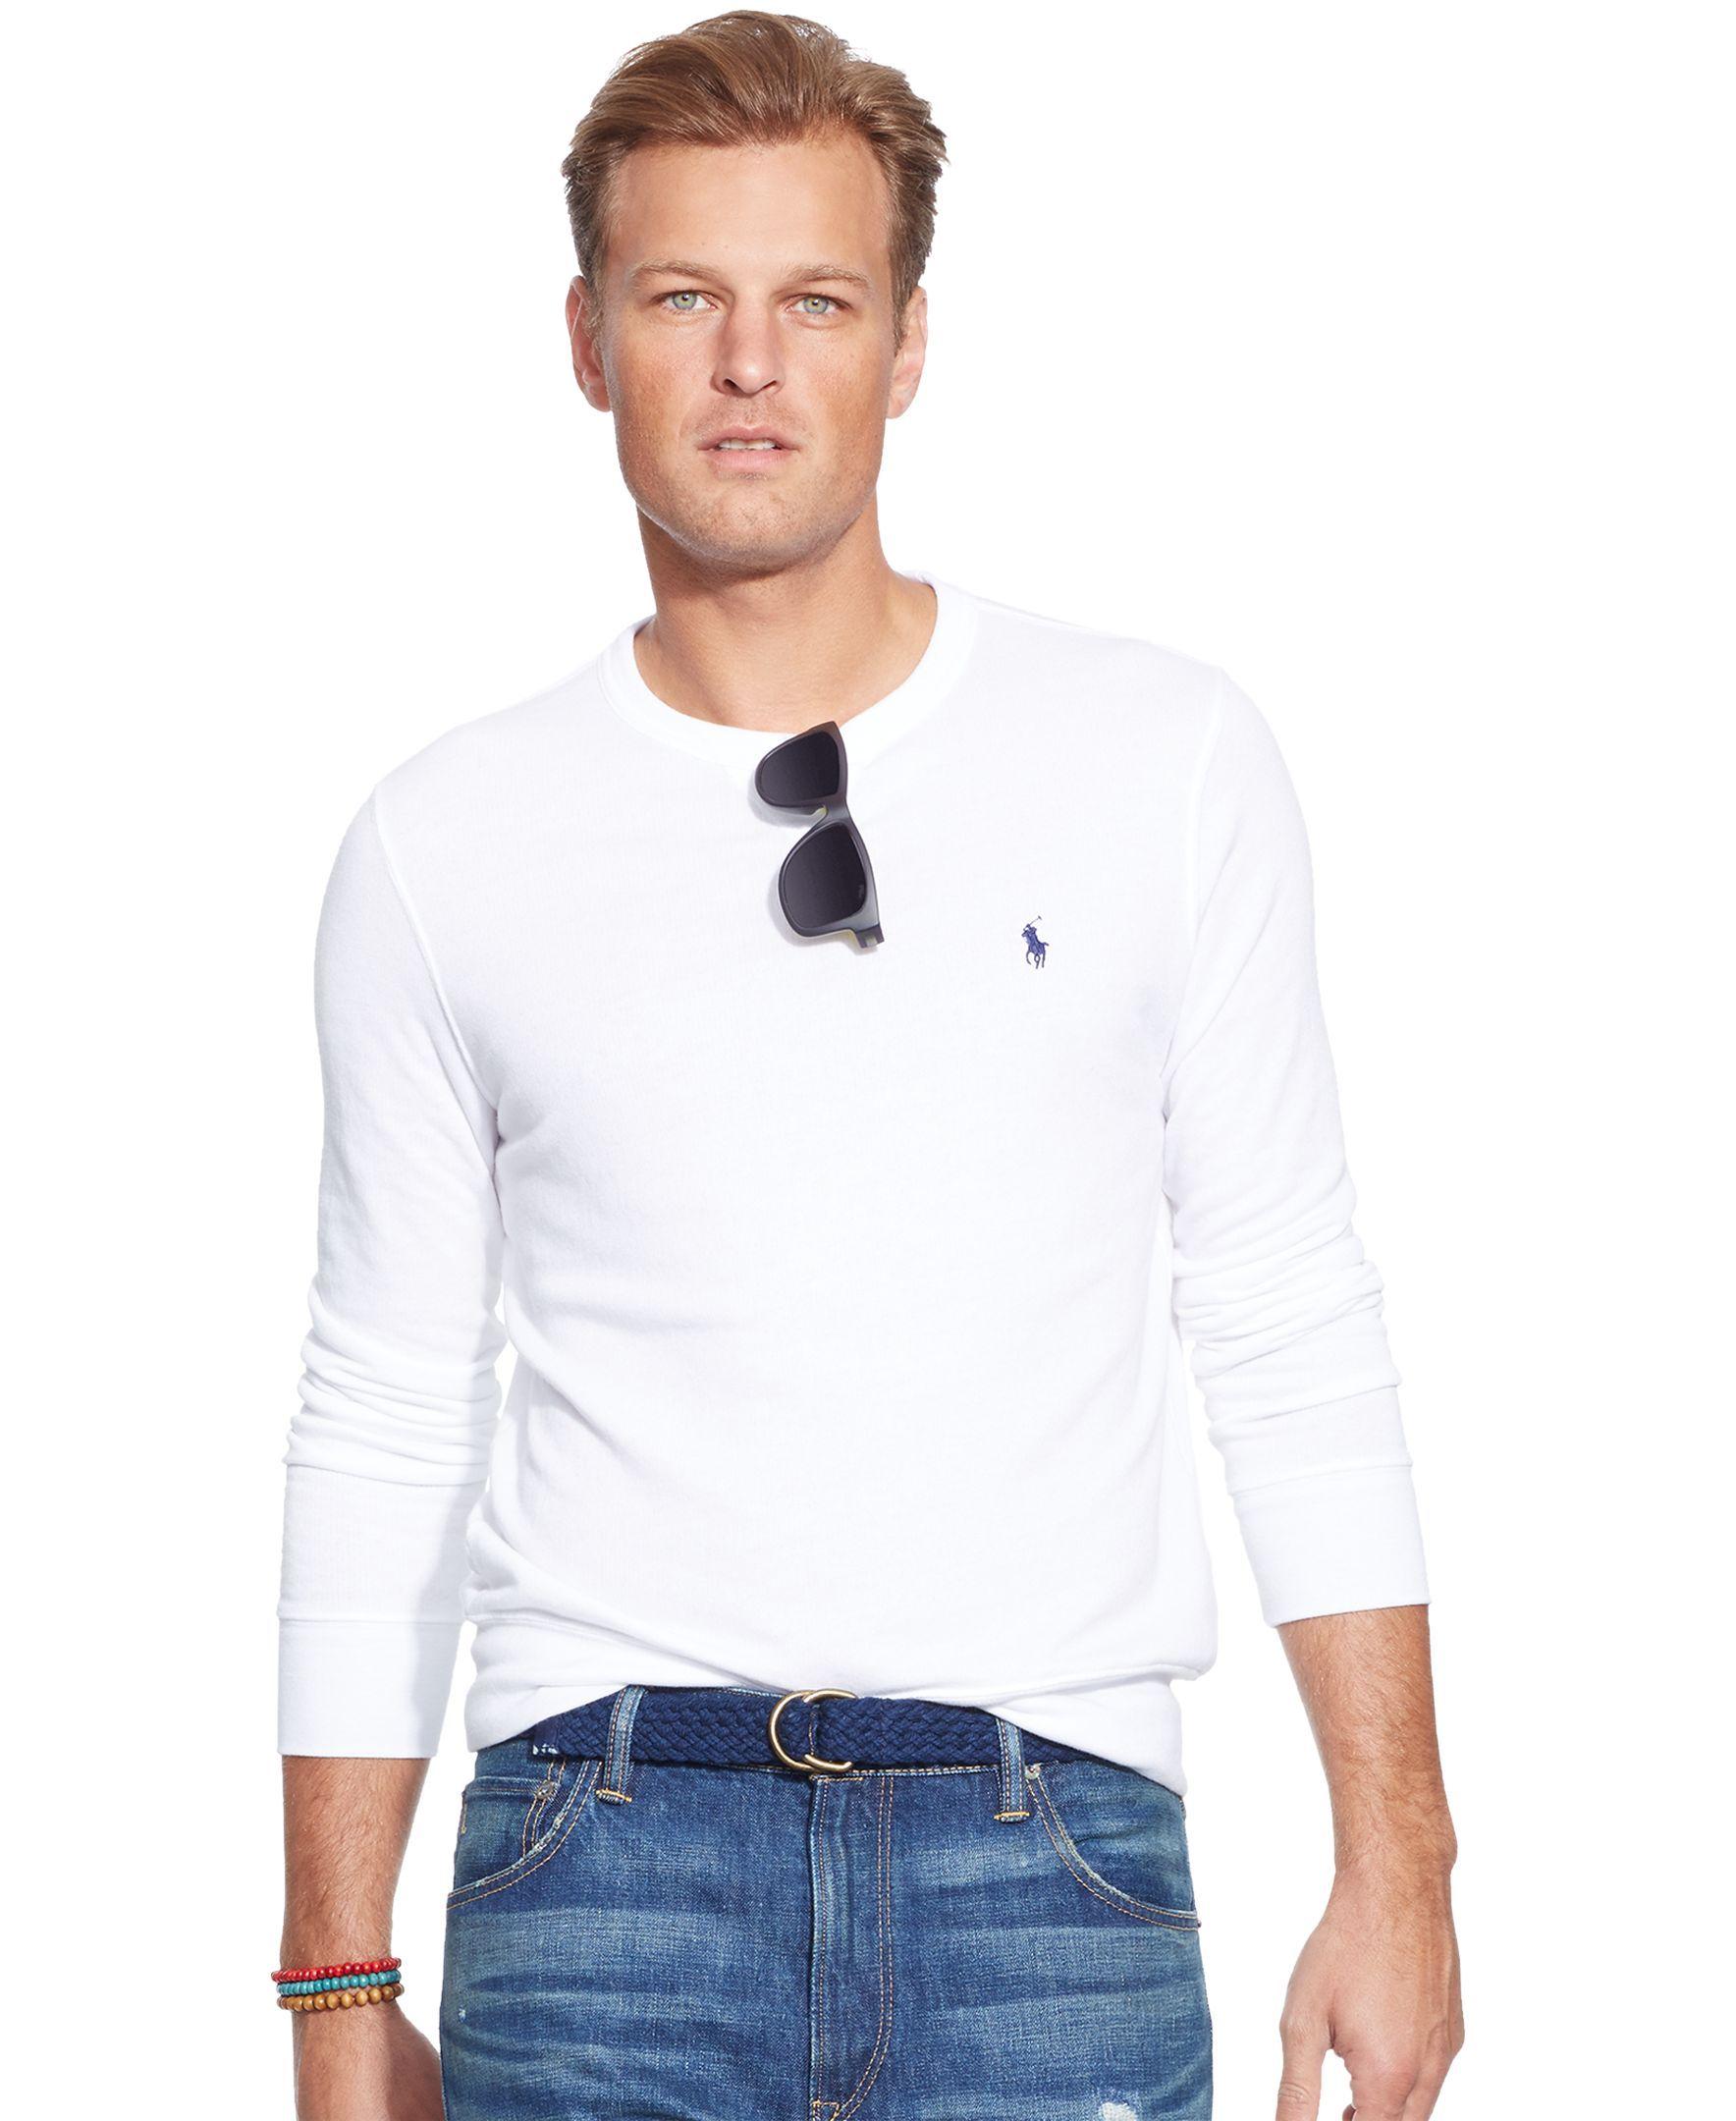 Large Tall Long Sleeve Polo Shirts Bcd Tofu House